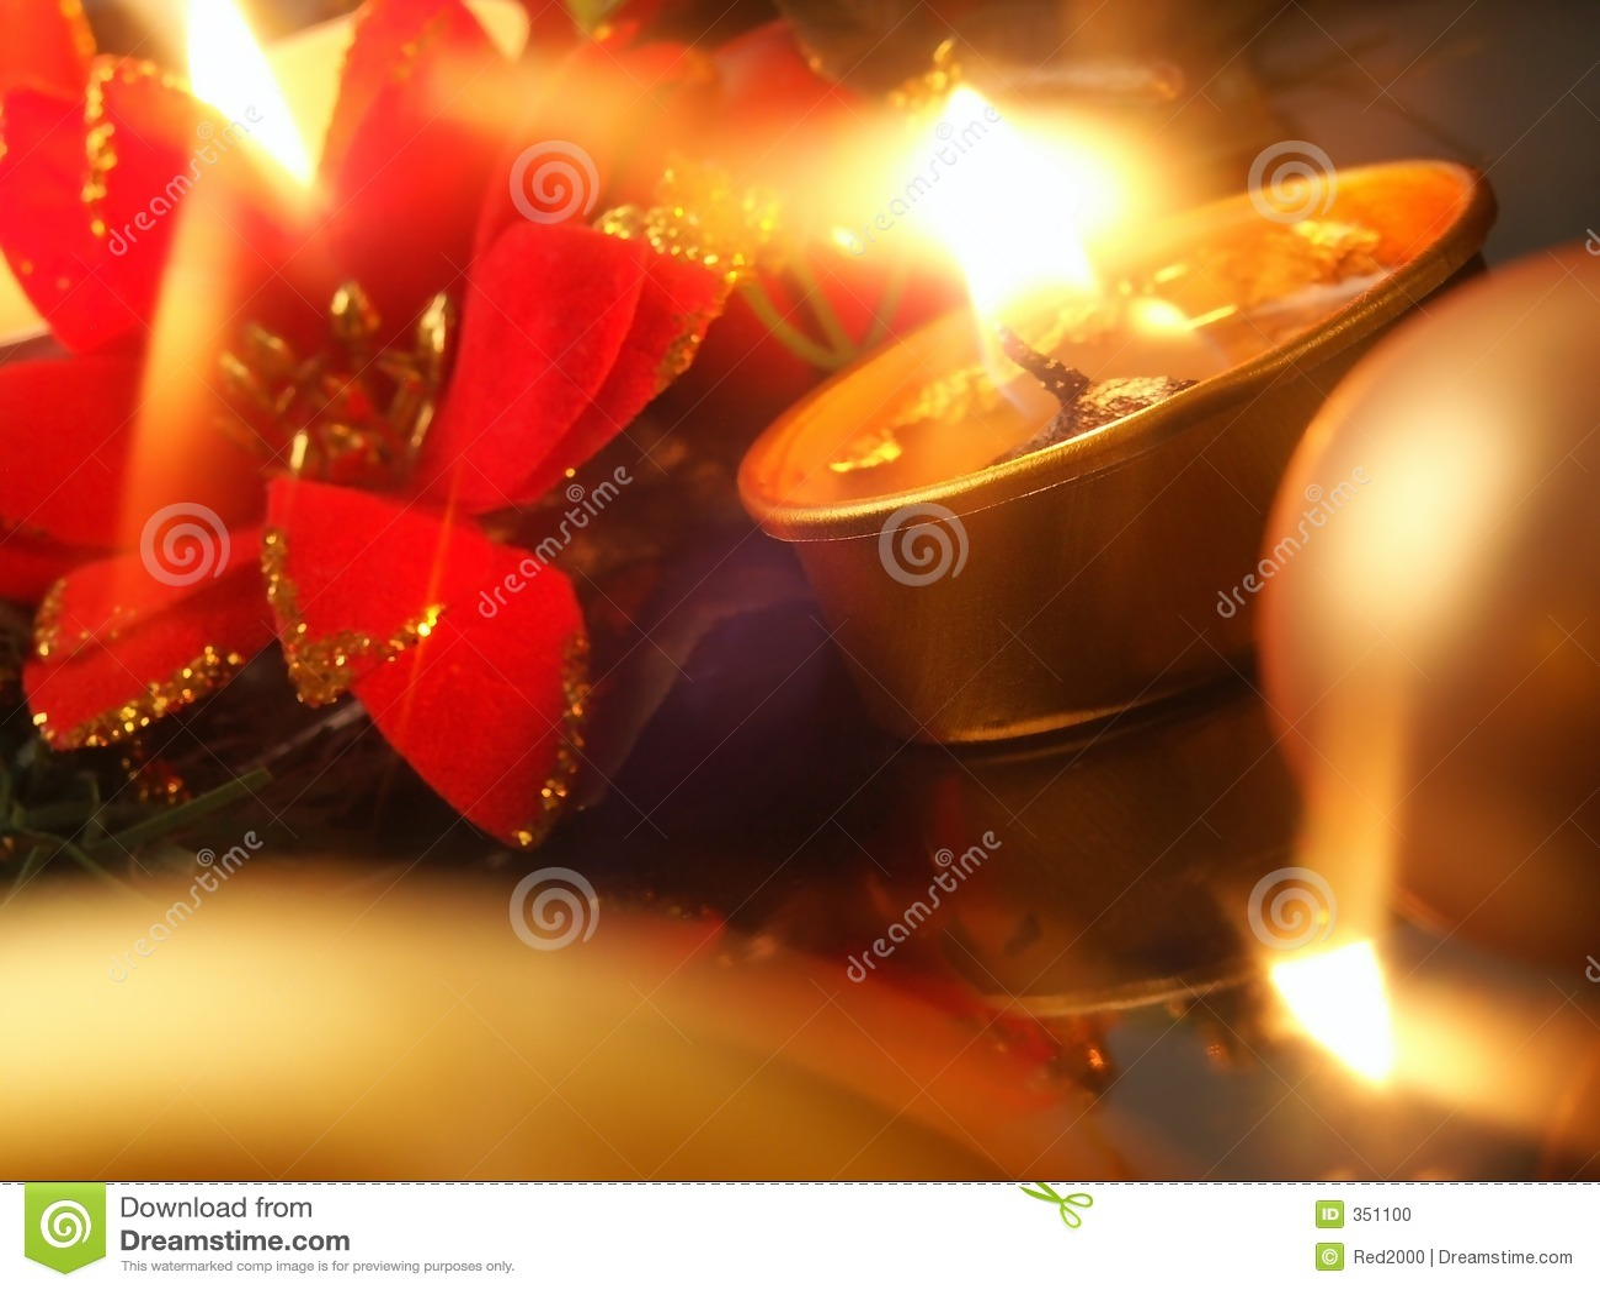 Download Candle stock photo. Image of onrnaments, orange, celebration - 351100